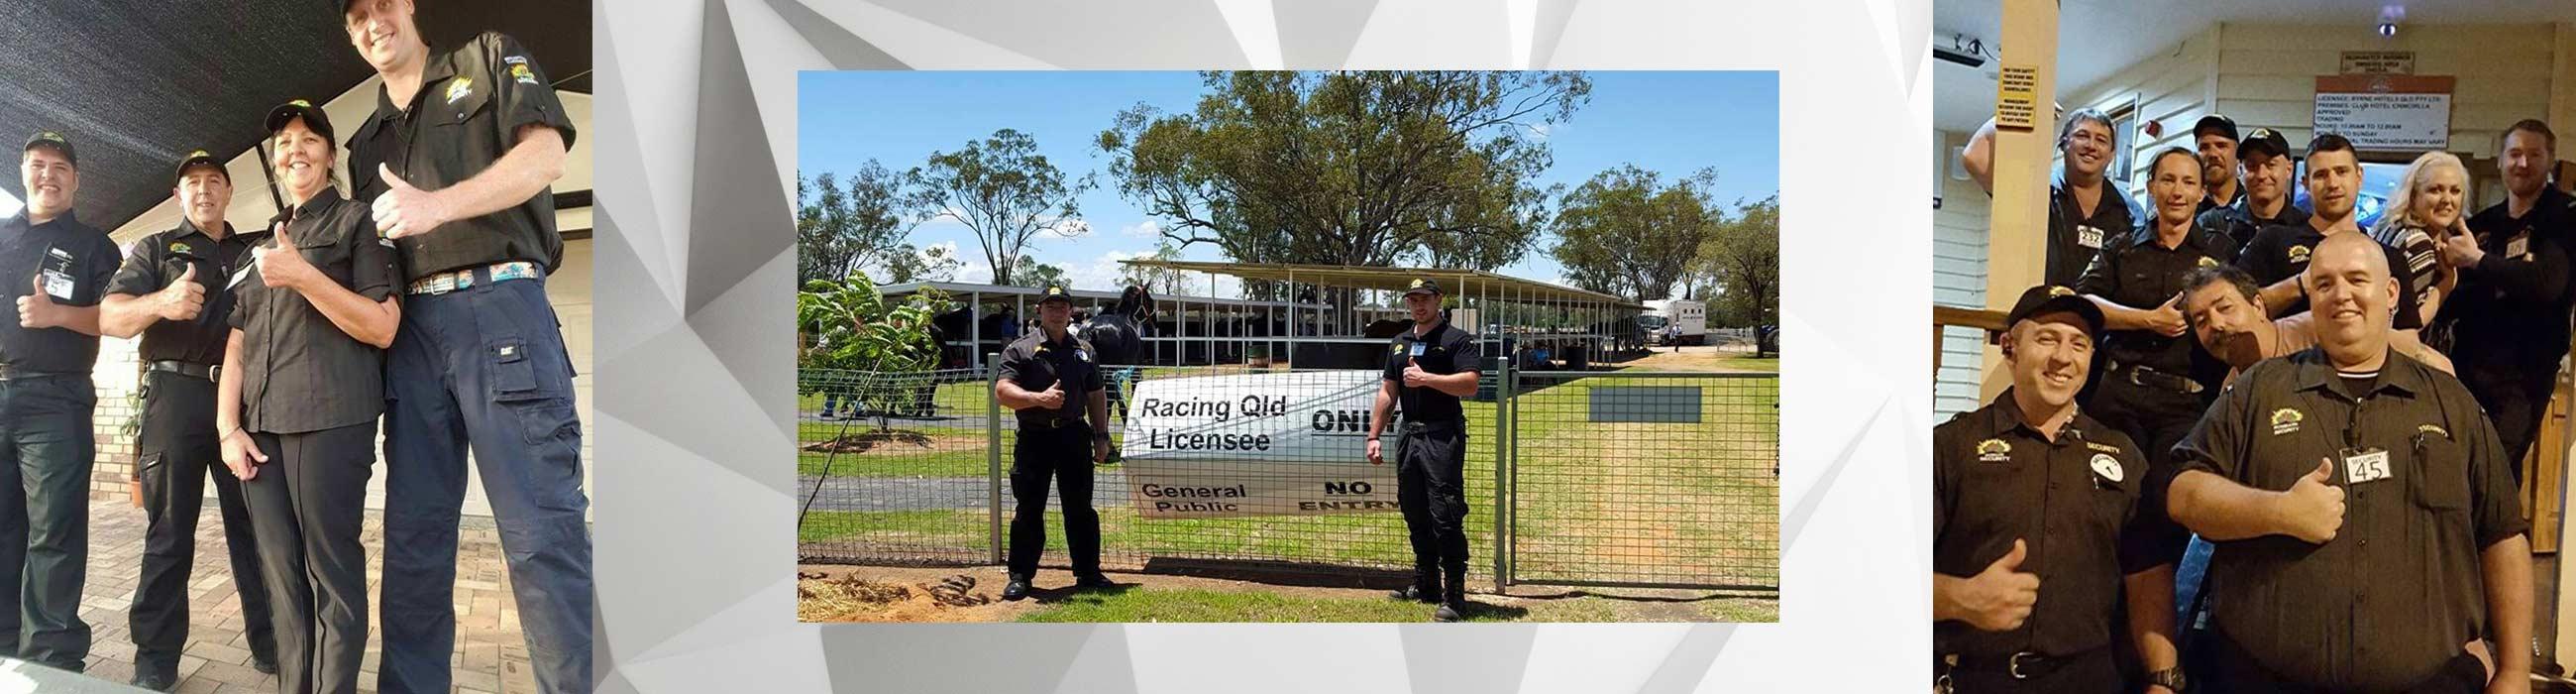 ironbark security service at queensland racing course